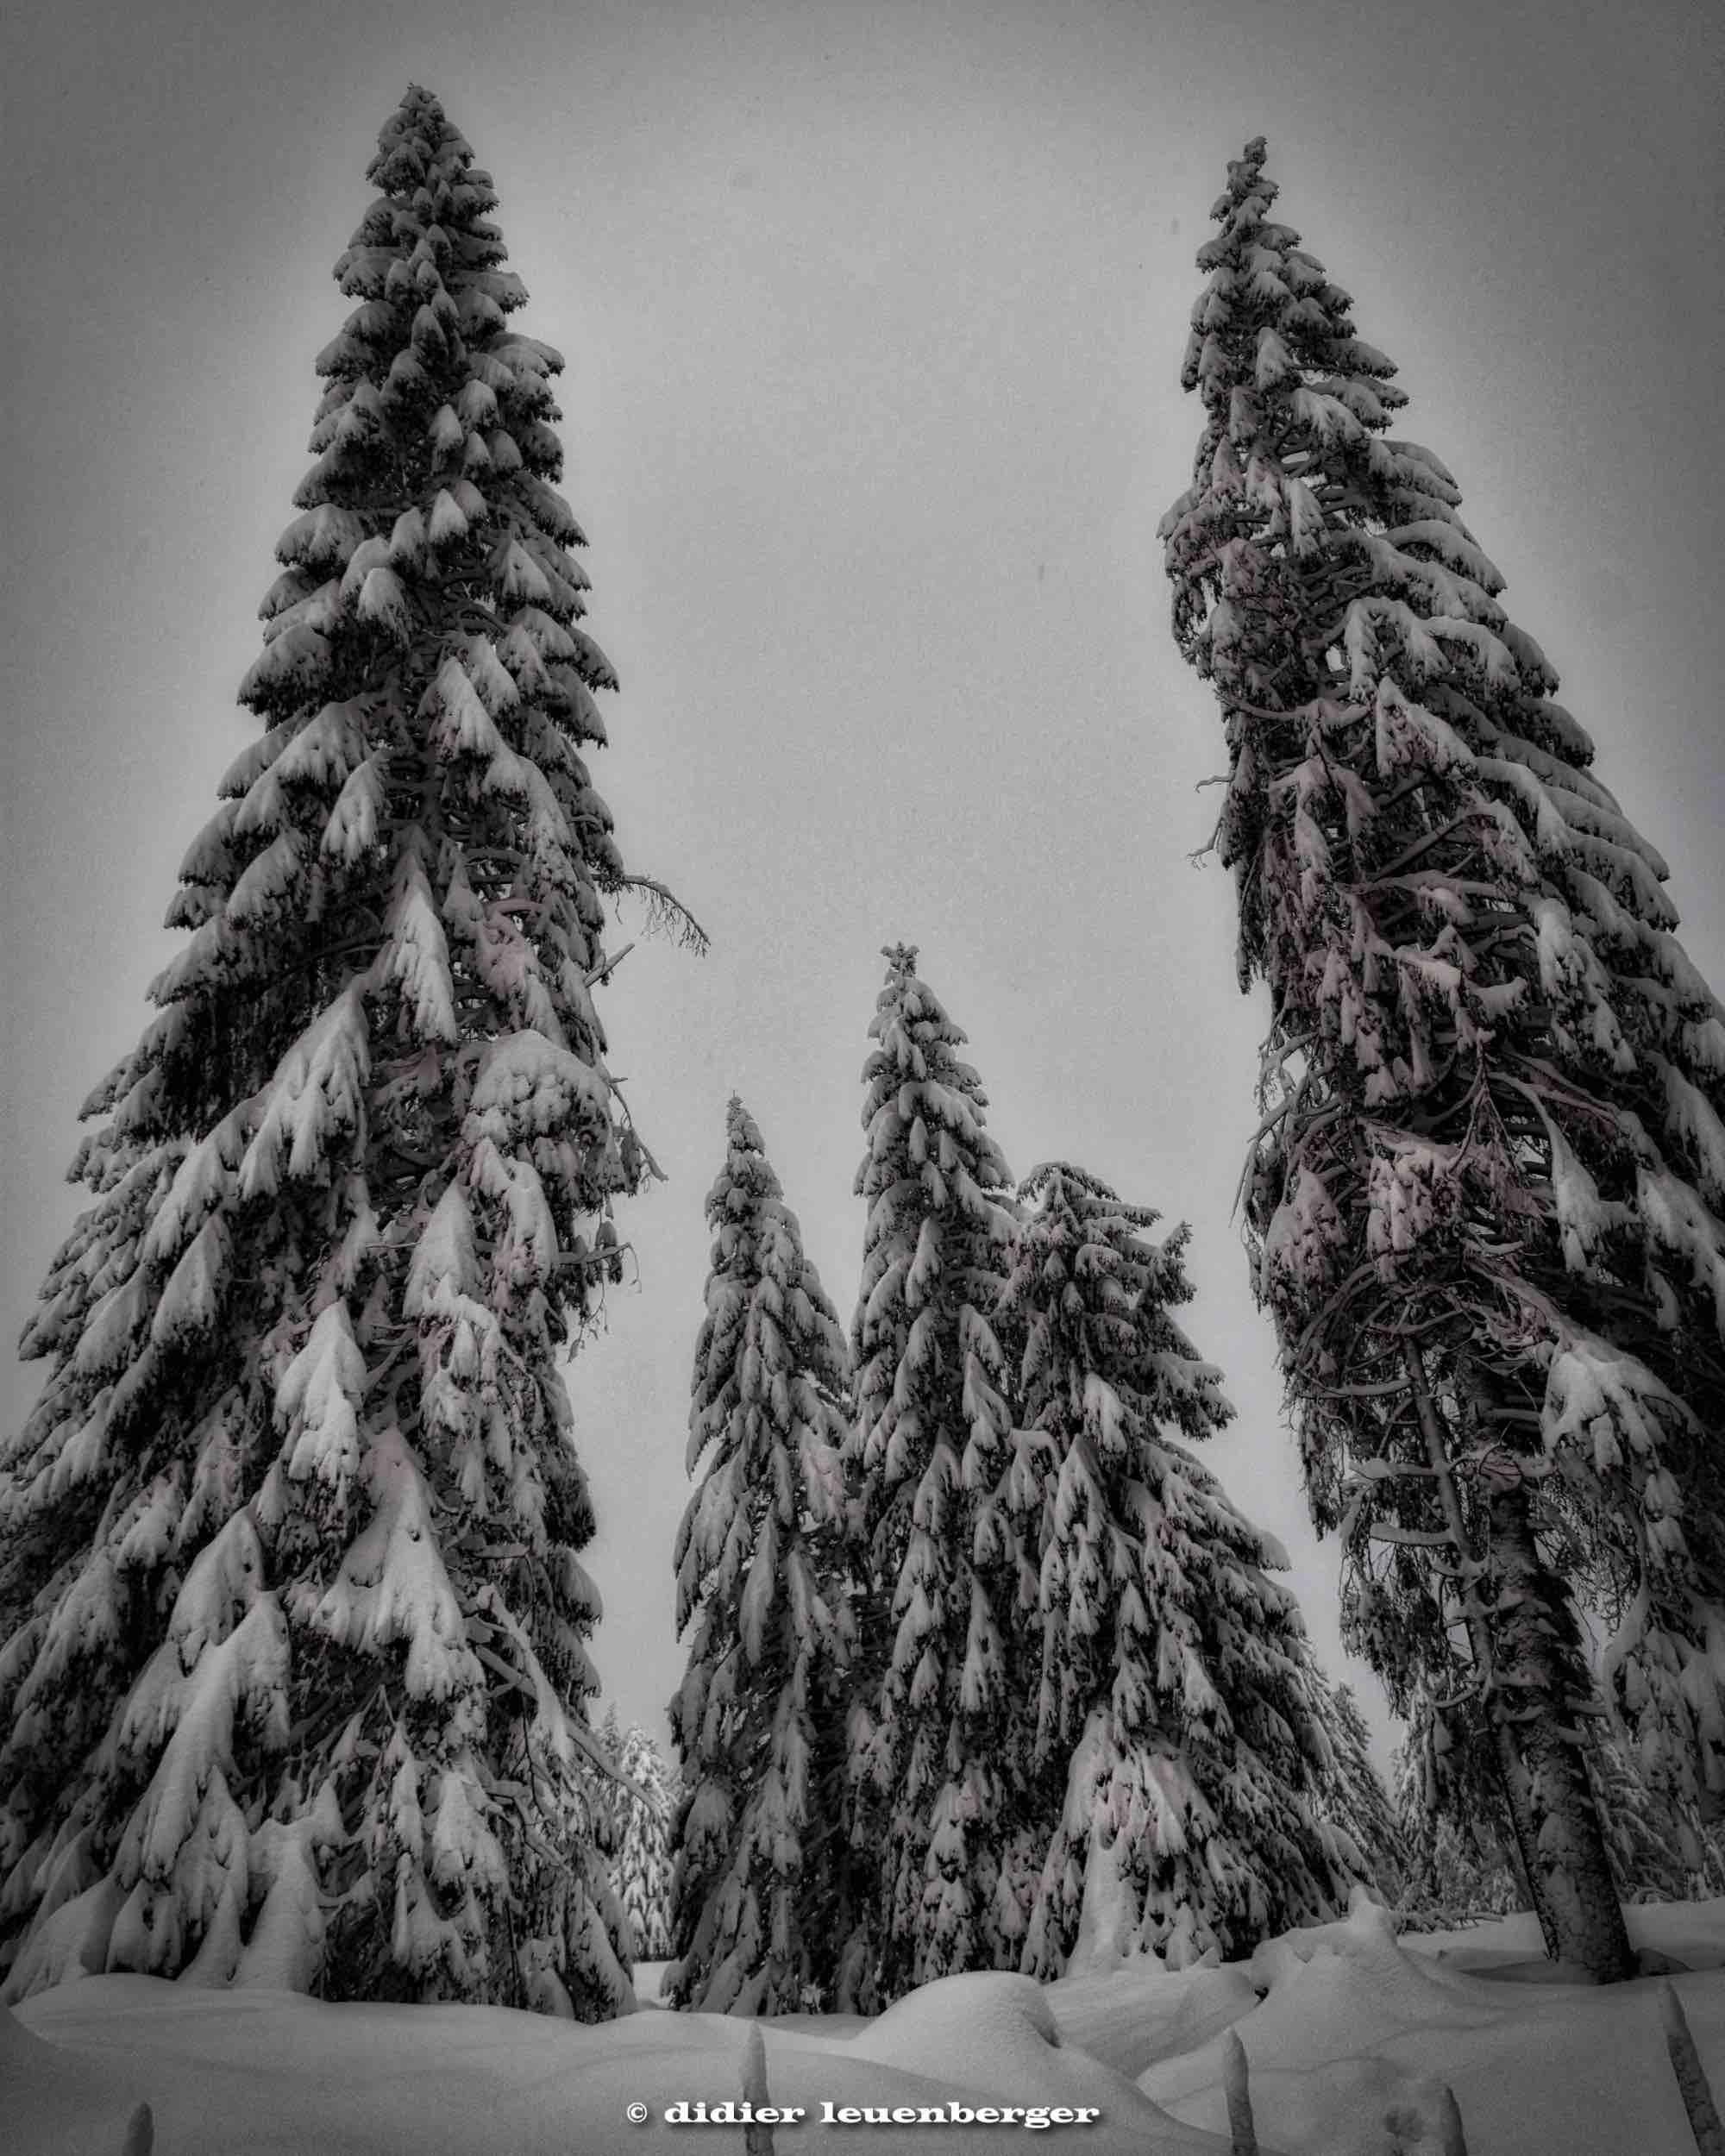 SUISSE PACCOTS PHOTO N7100 12 DECEMBRE 2017 218_HDR6.jpg